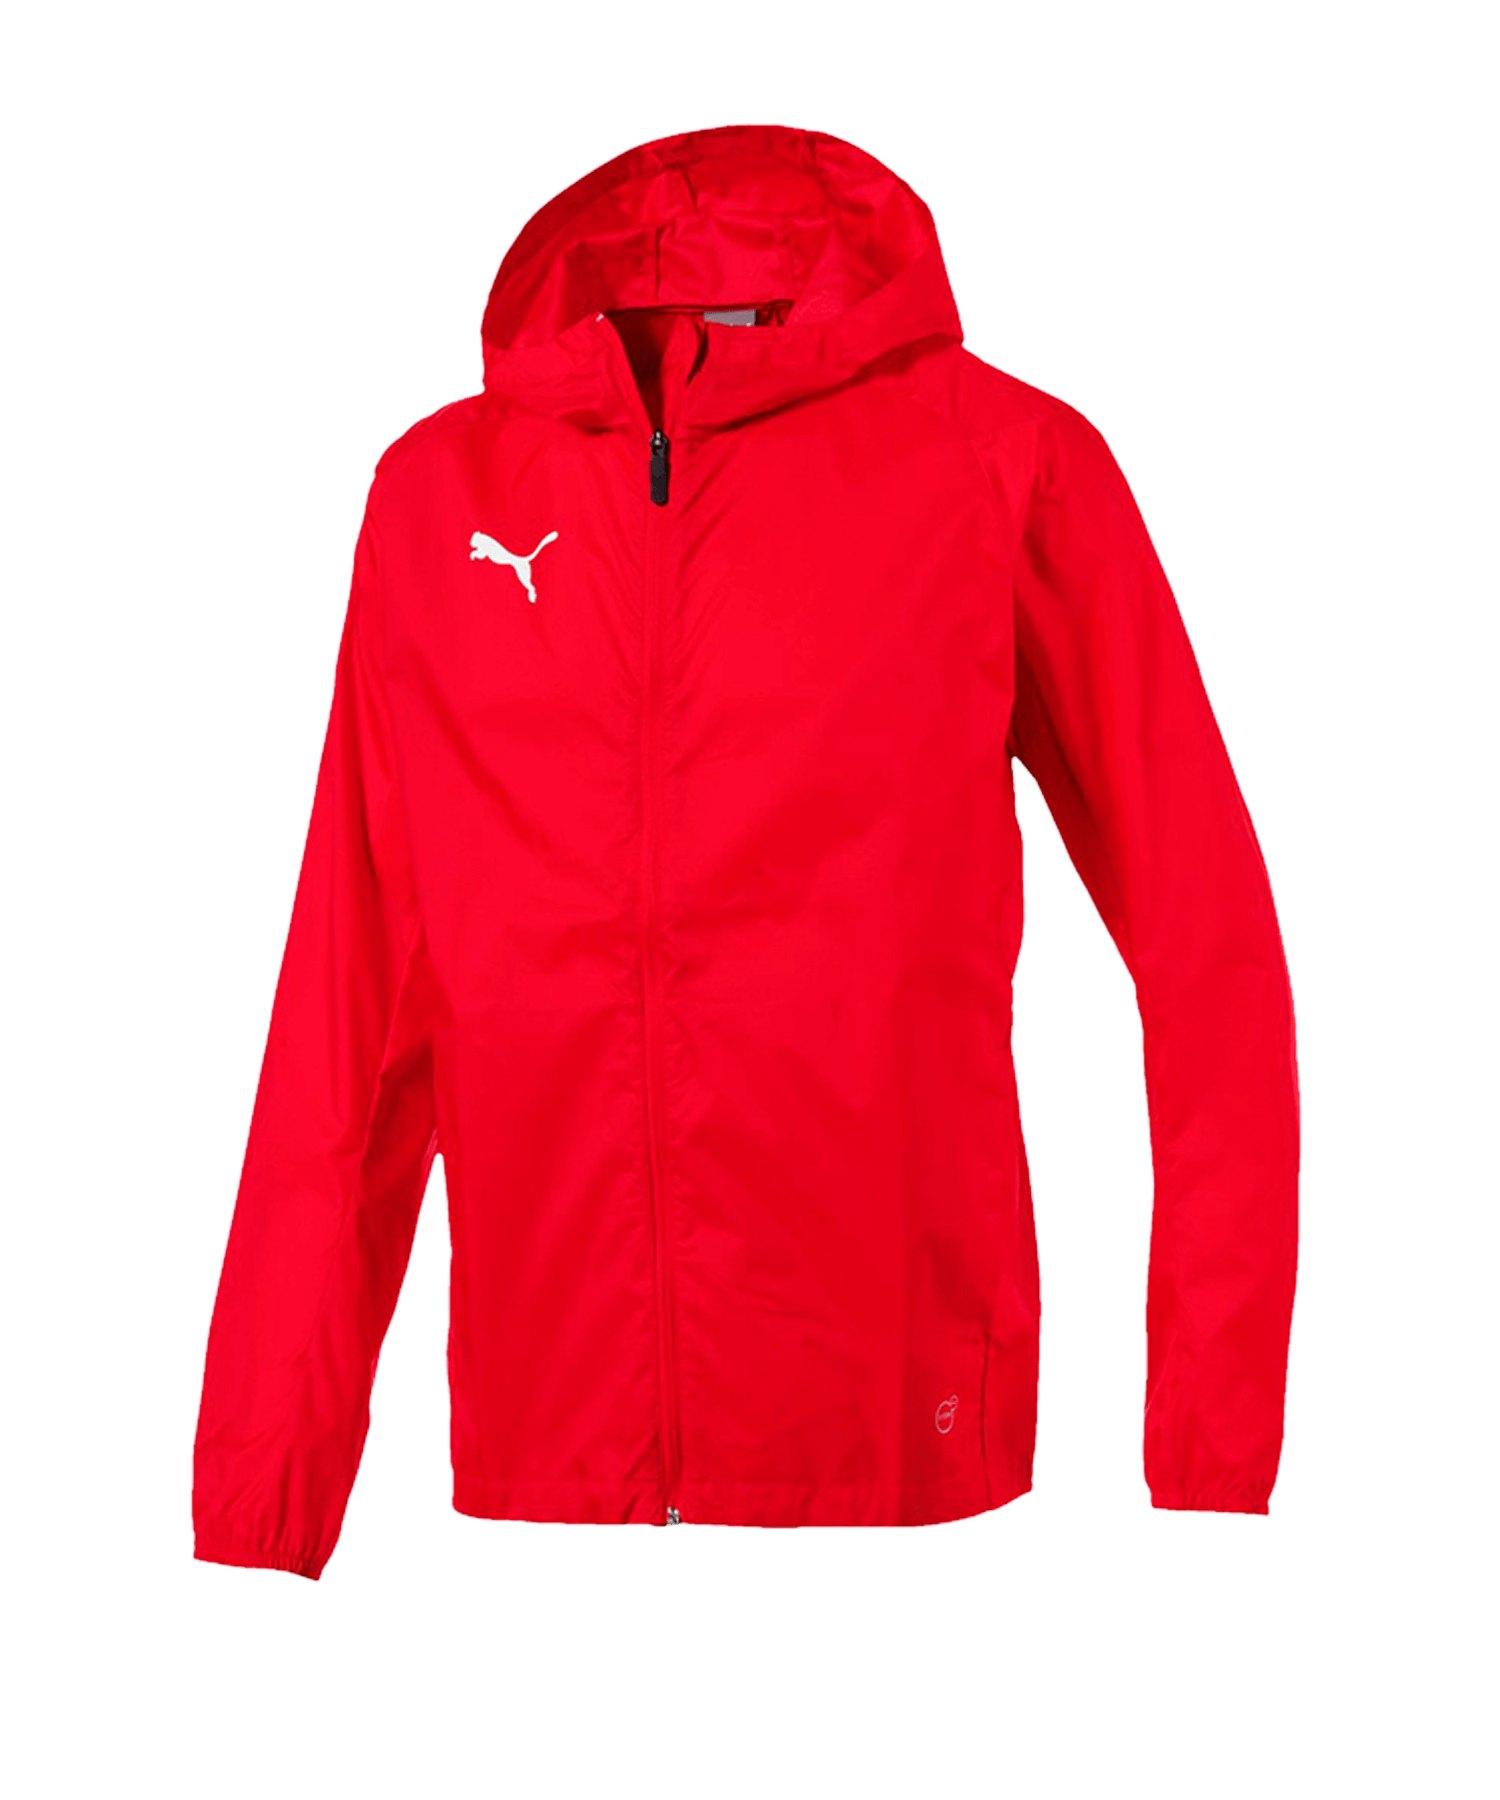 PUMA LIGA Training Rain Jacket Jacke Rot F01 - rot